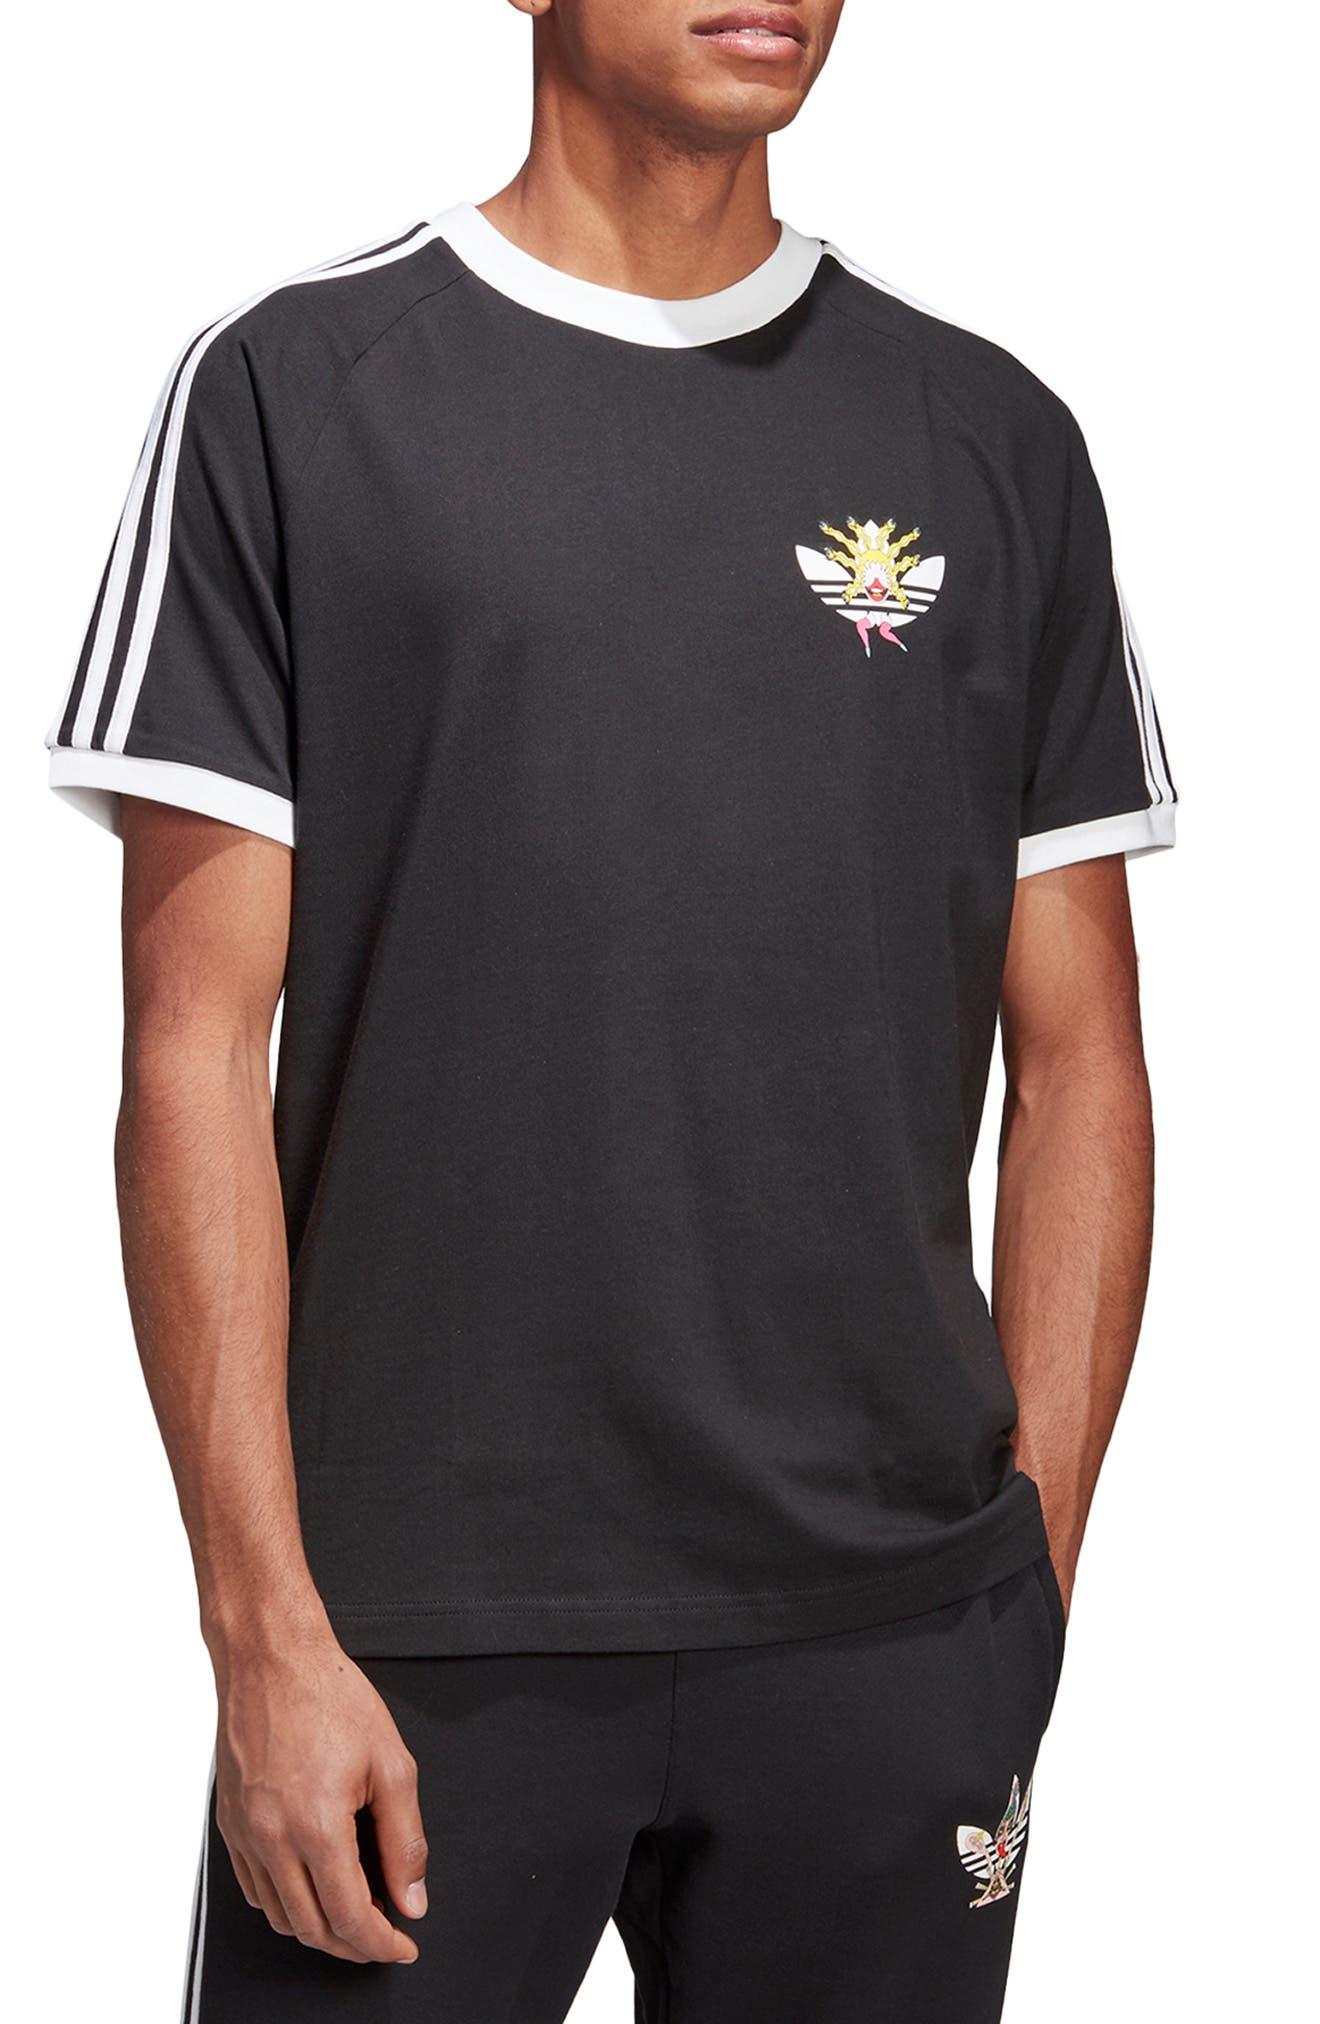 Adidas Originals Tanaami Cali Logo T-Shirt, Black